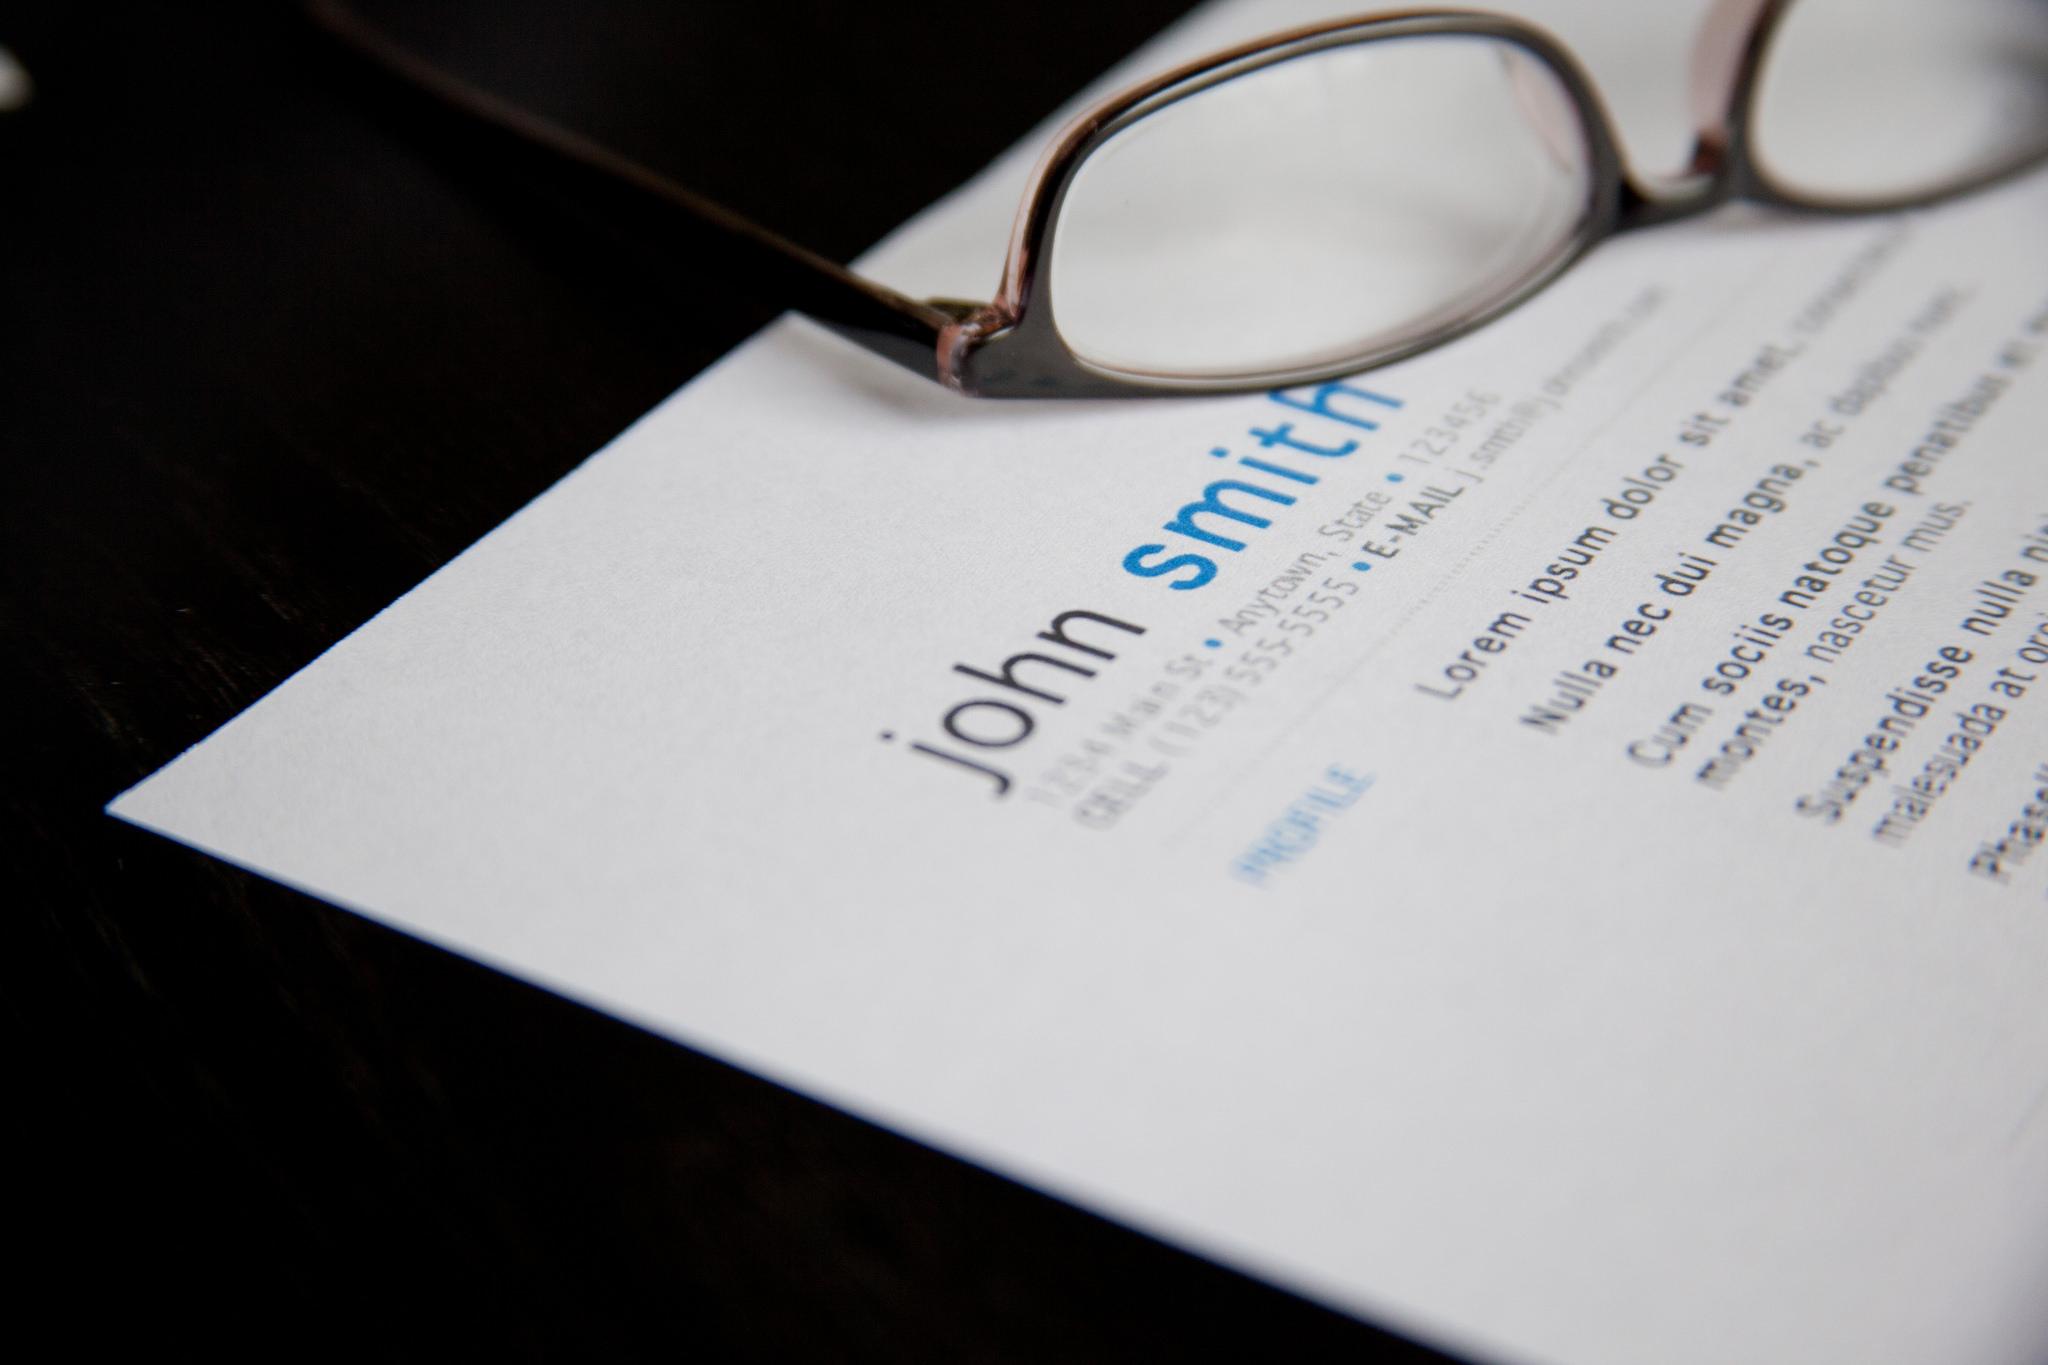 LXP - Lifexpe - creative resume job passbort to get a new job